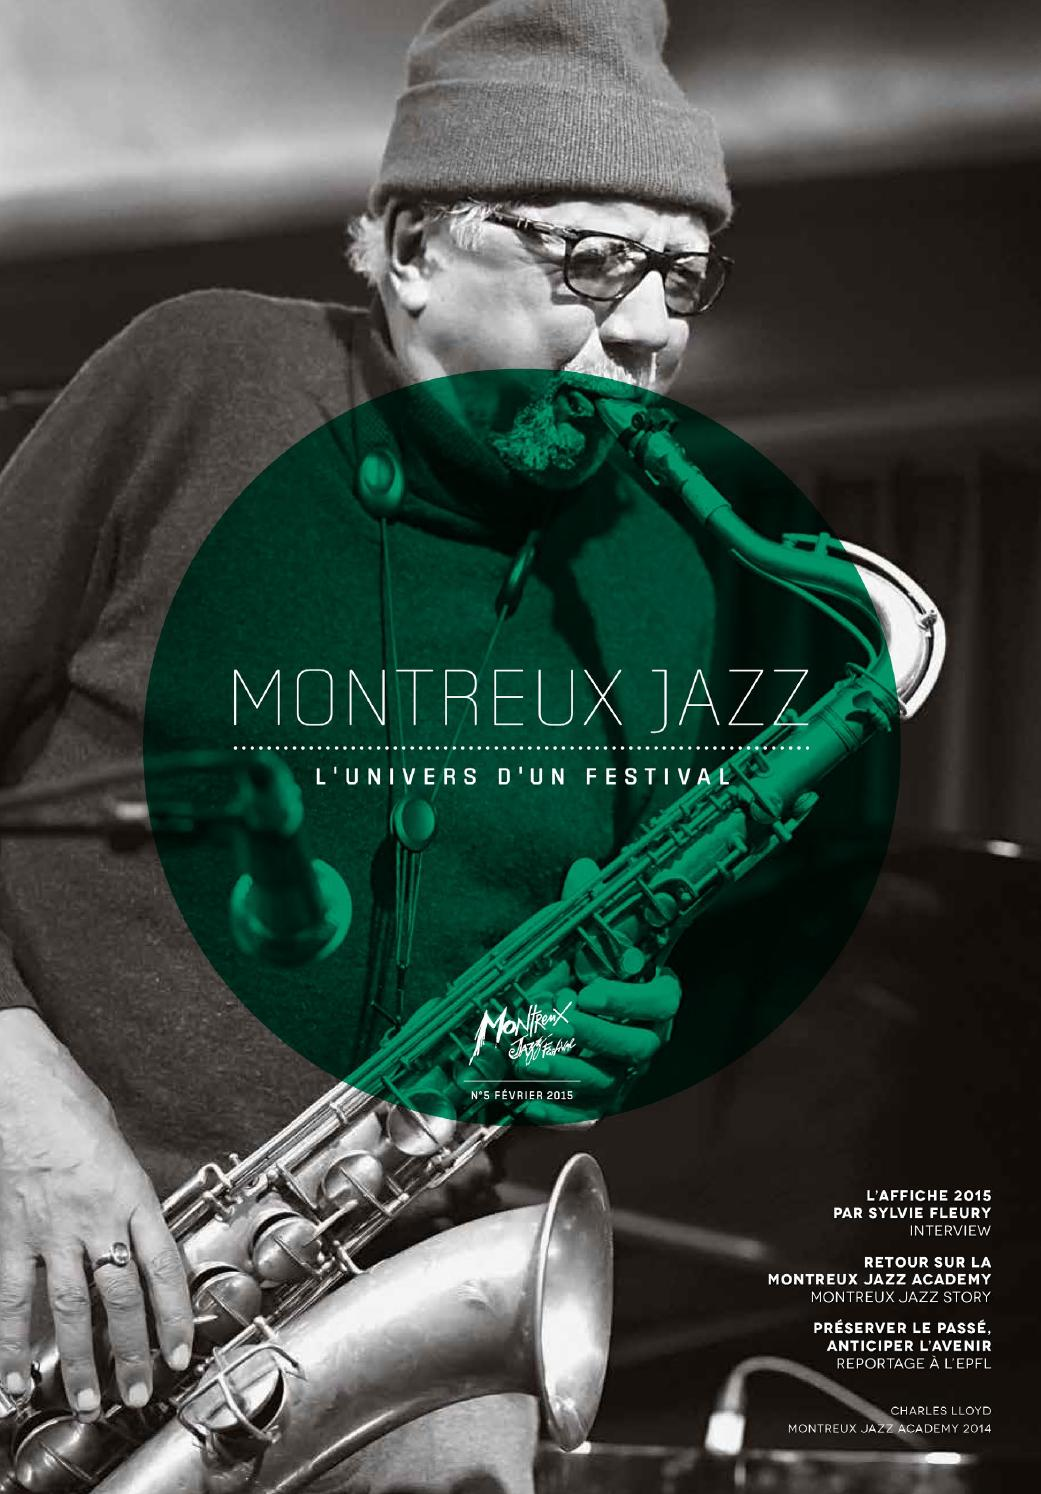 Montreux Jazz Festival 2015 >> Montreux Jazz Magazine - n° 5 by Montreux Jazz Festival